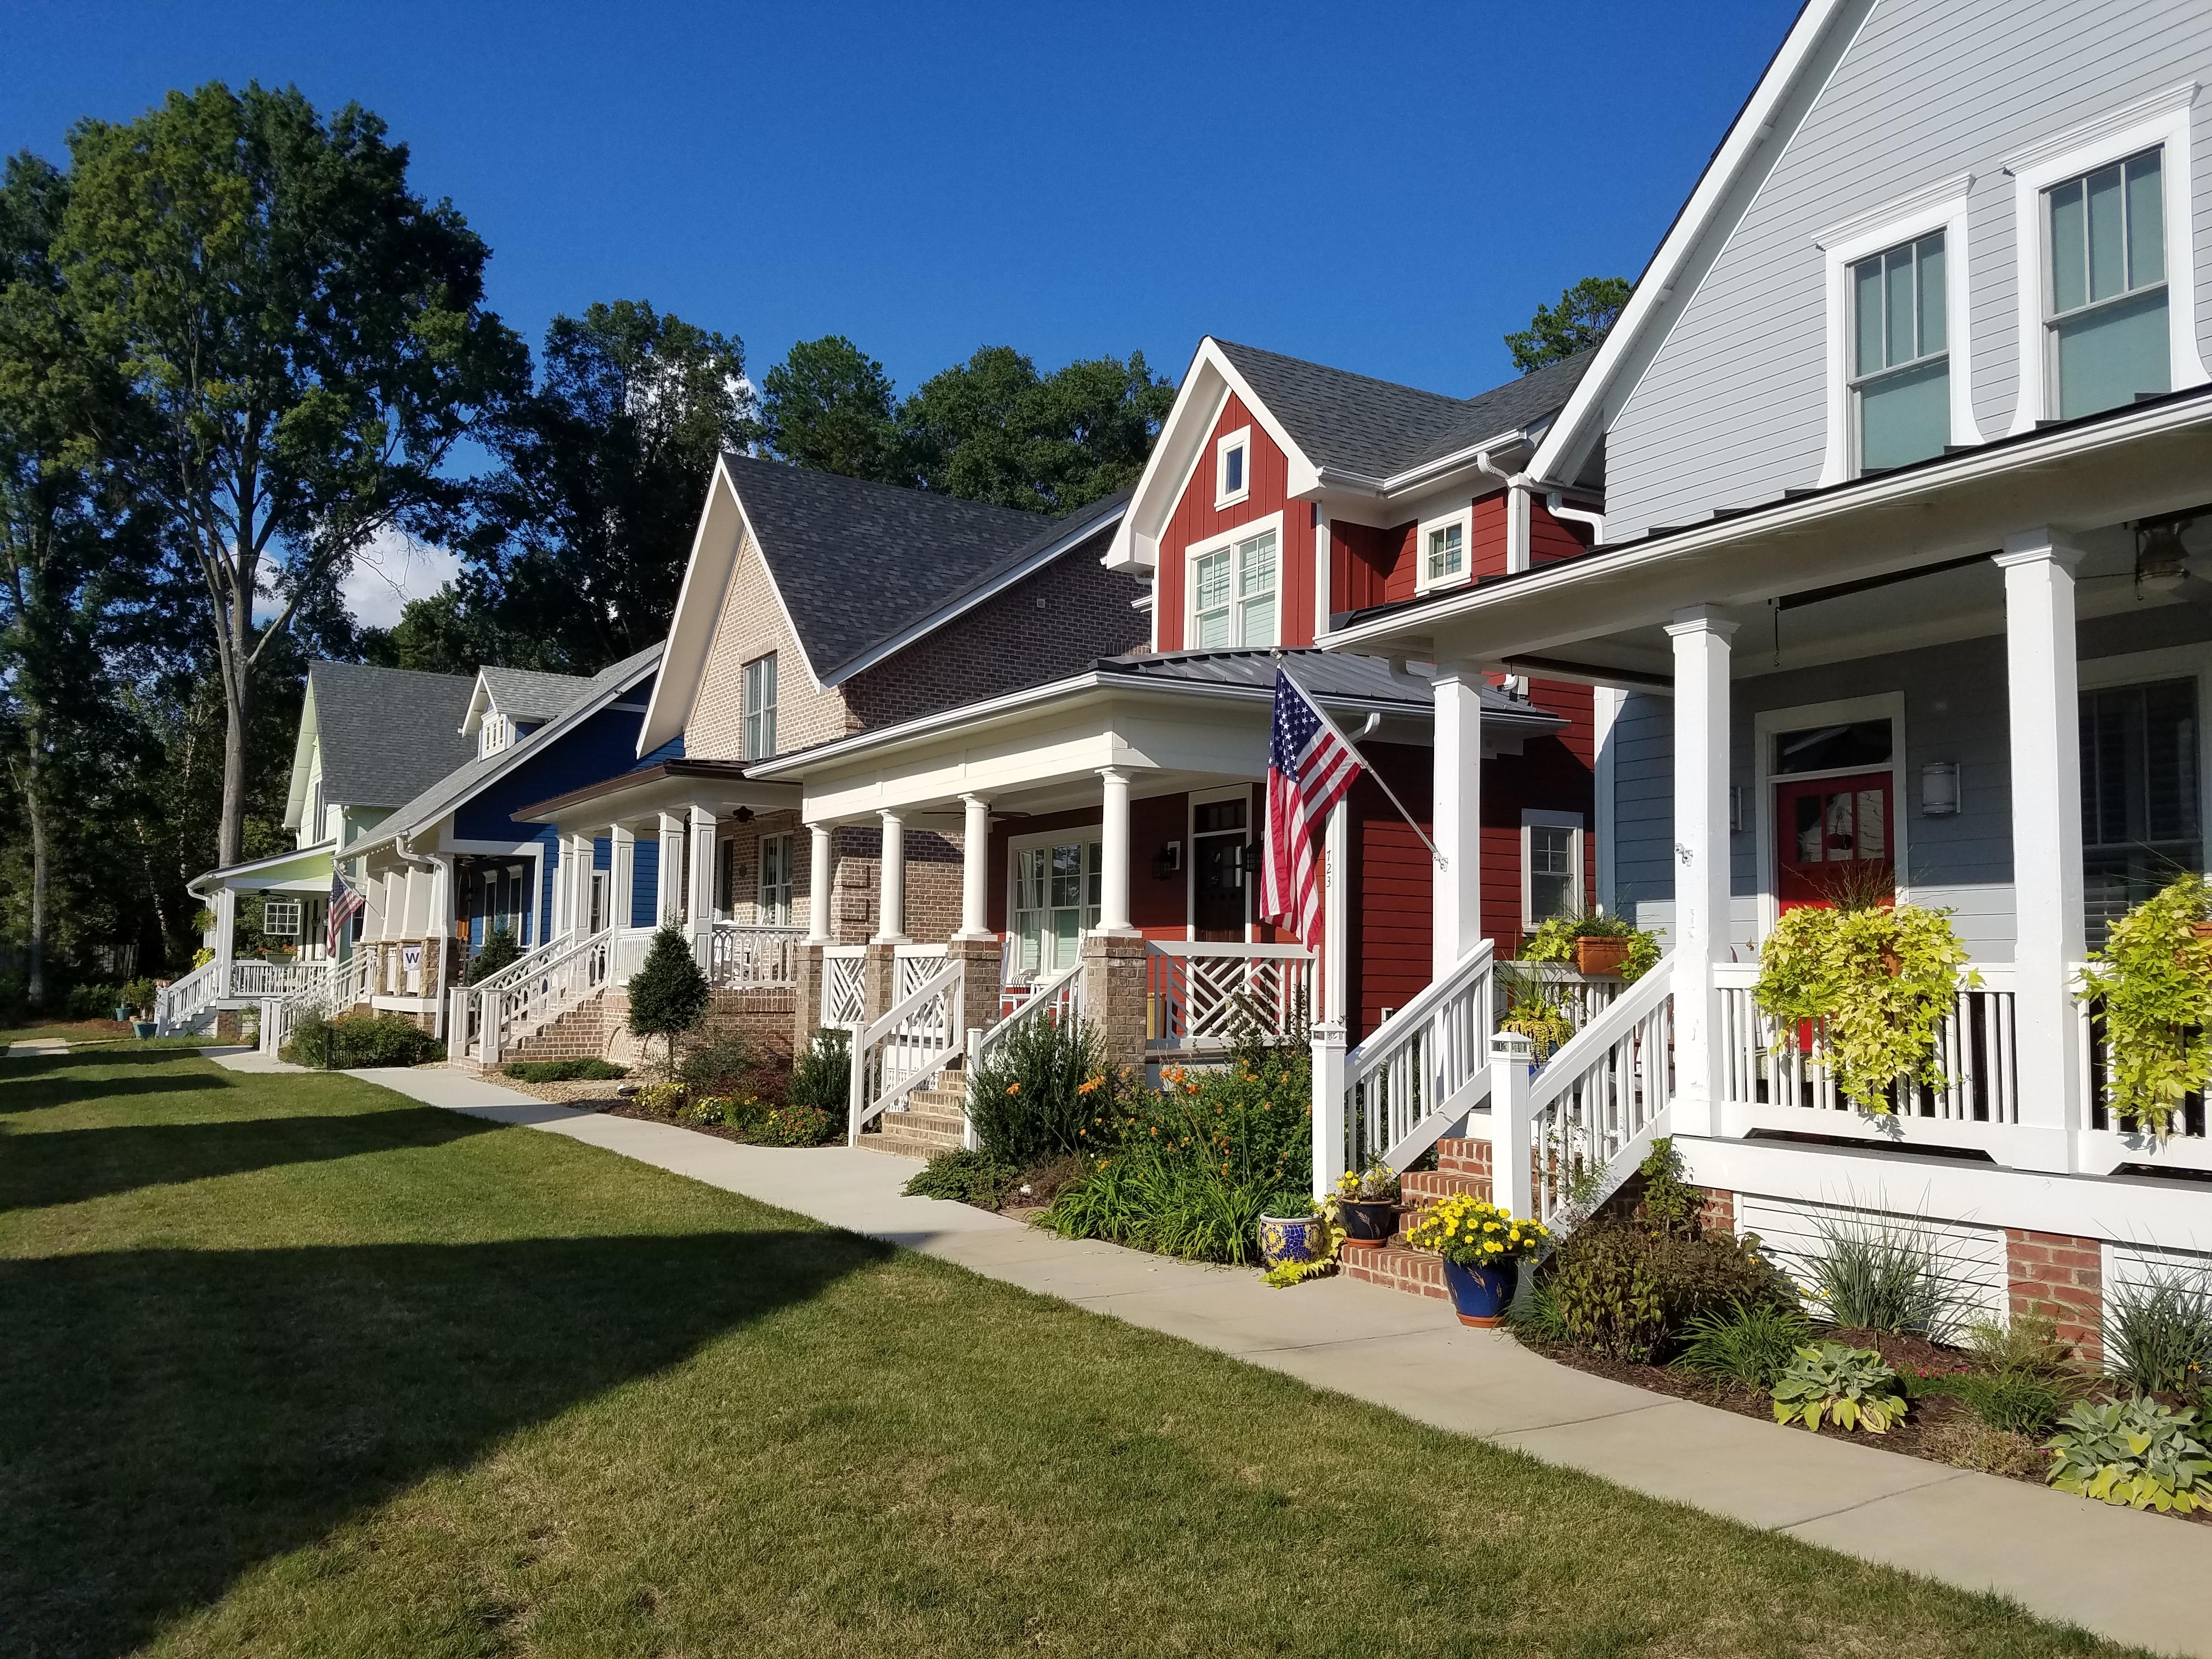 Carnege Mews Interior Homes 09-22-2017